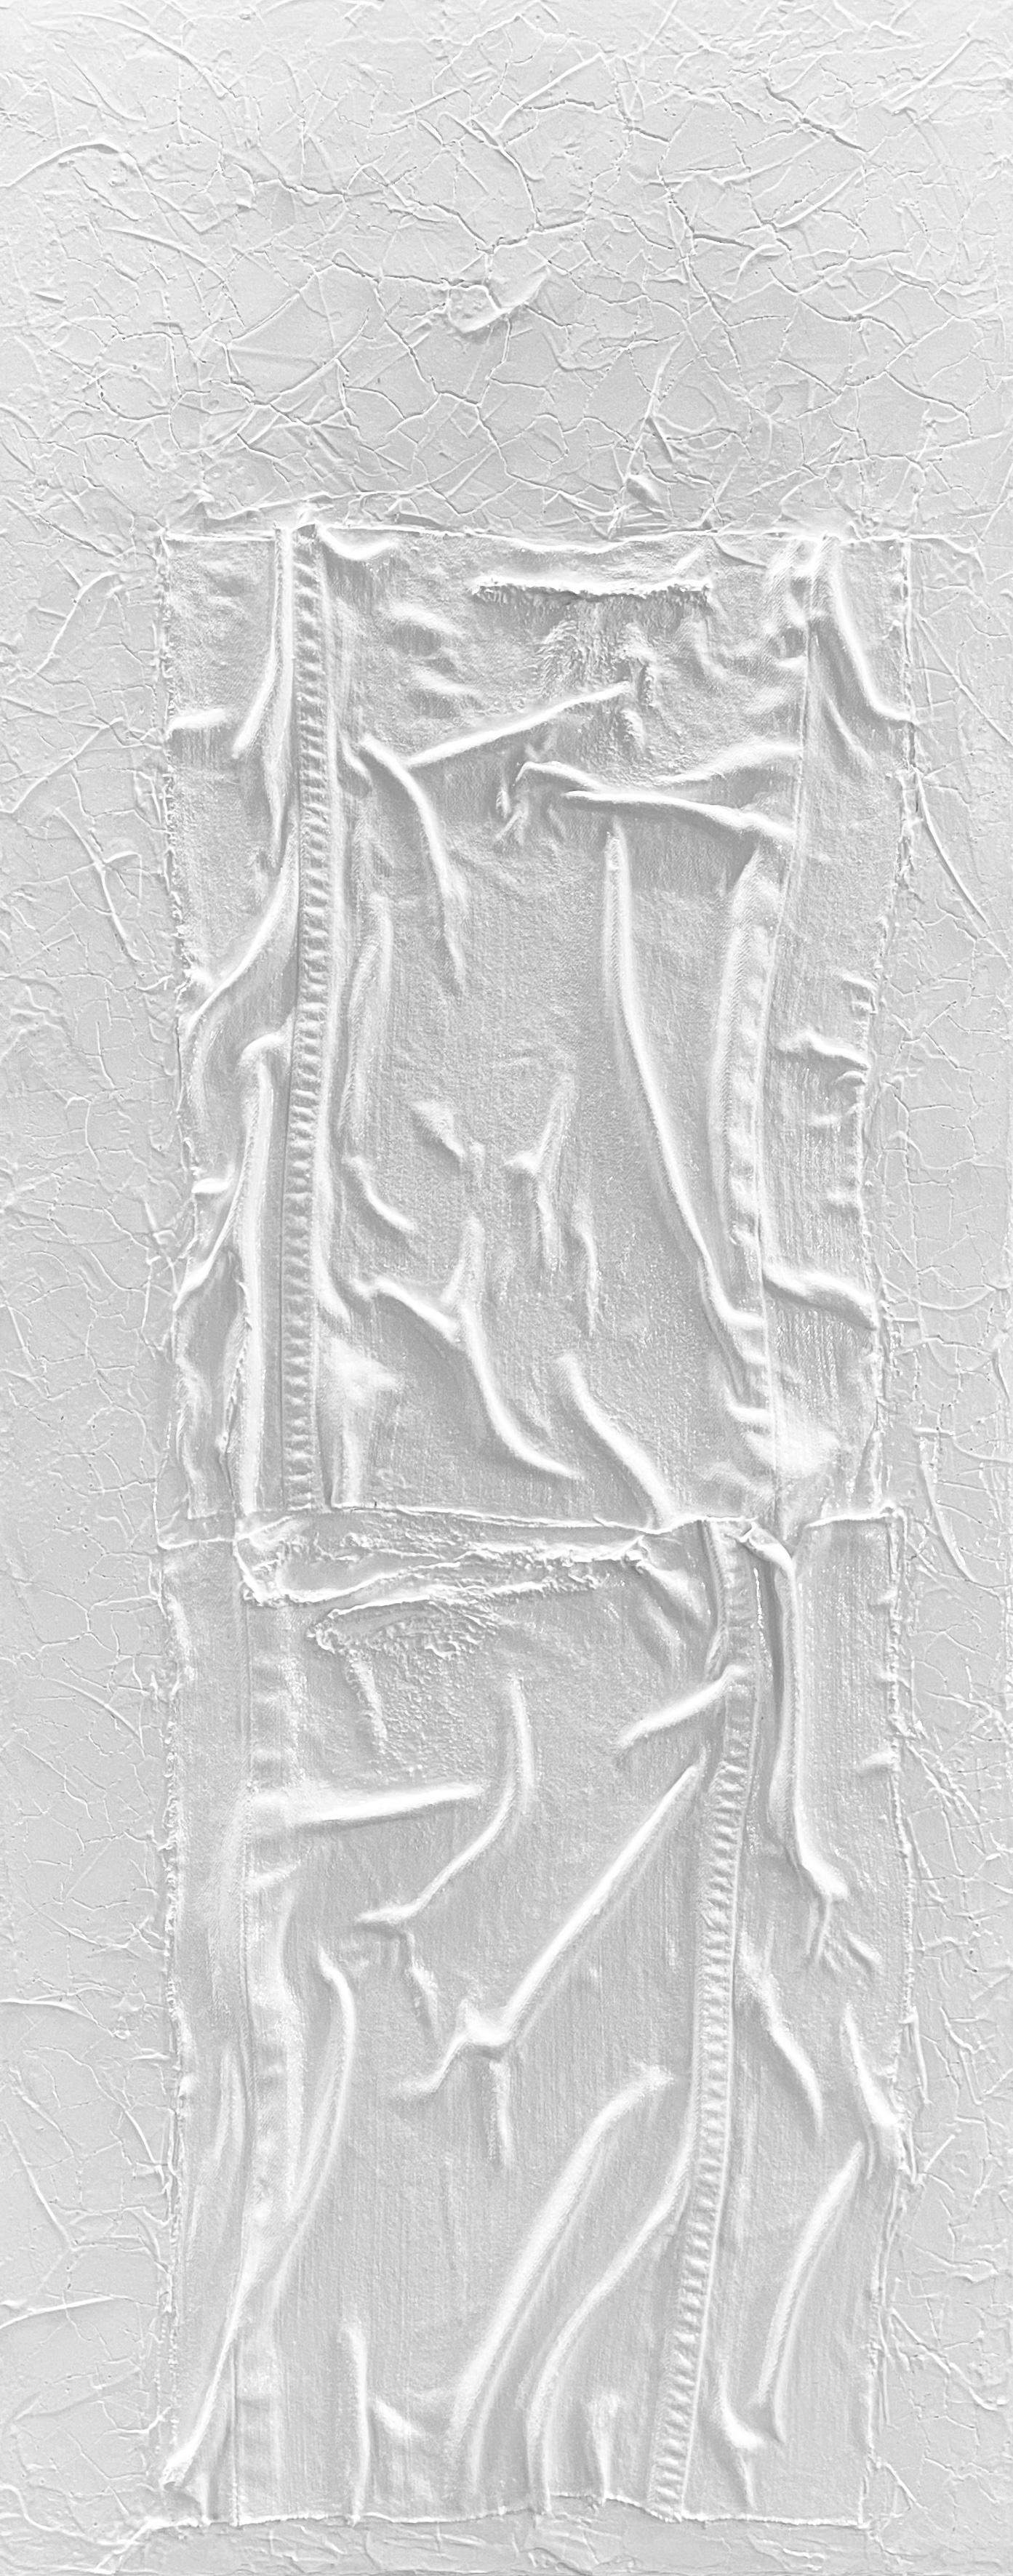 REALITE DECOMPOSEE 2.501</br> Acrylic on canvas 40 X 100 Signé au dos